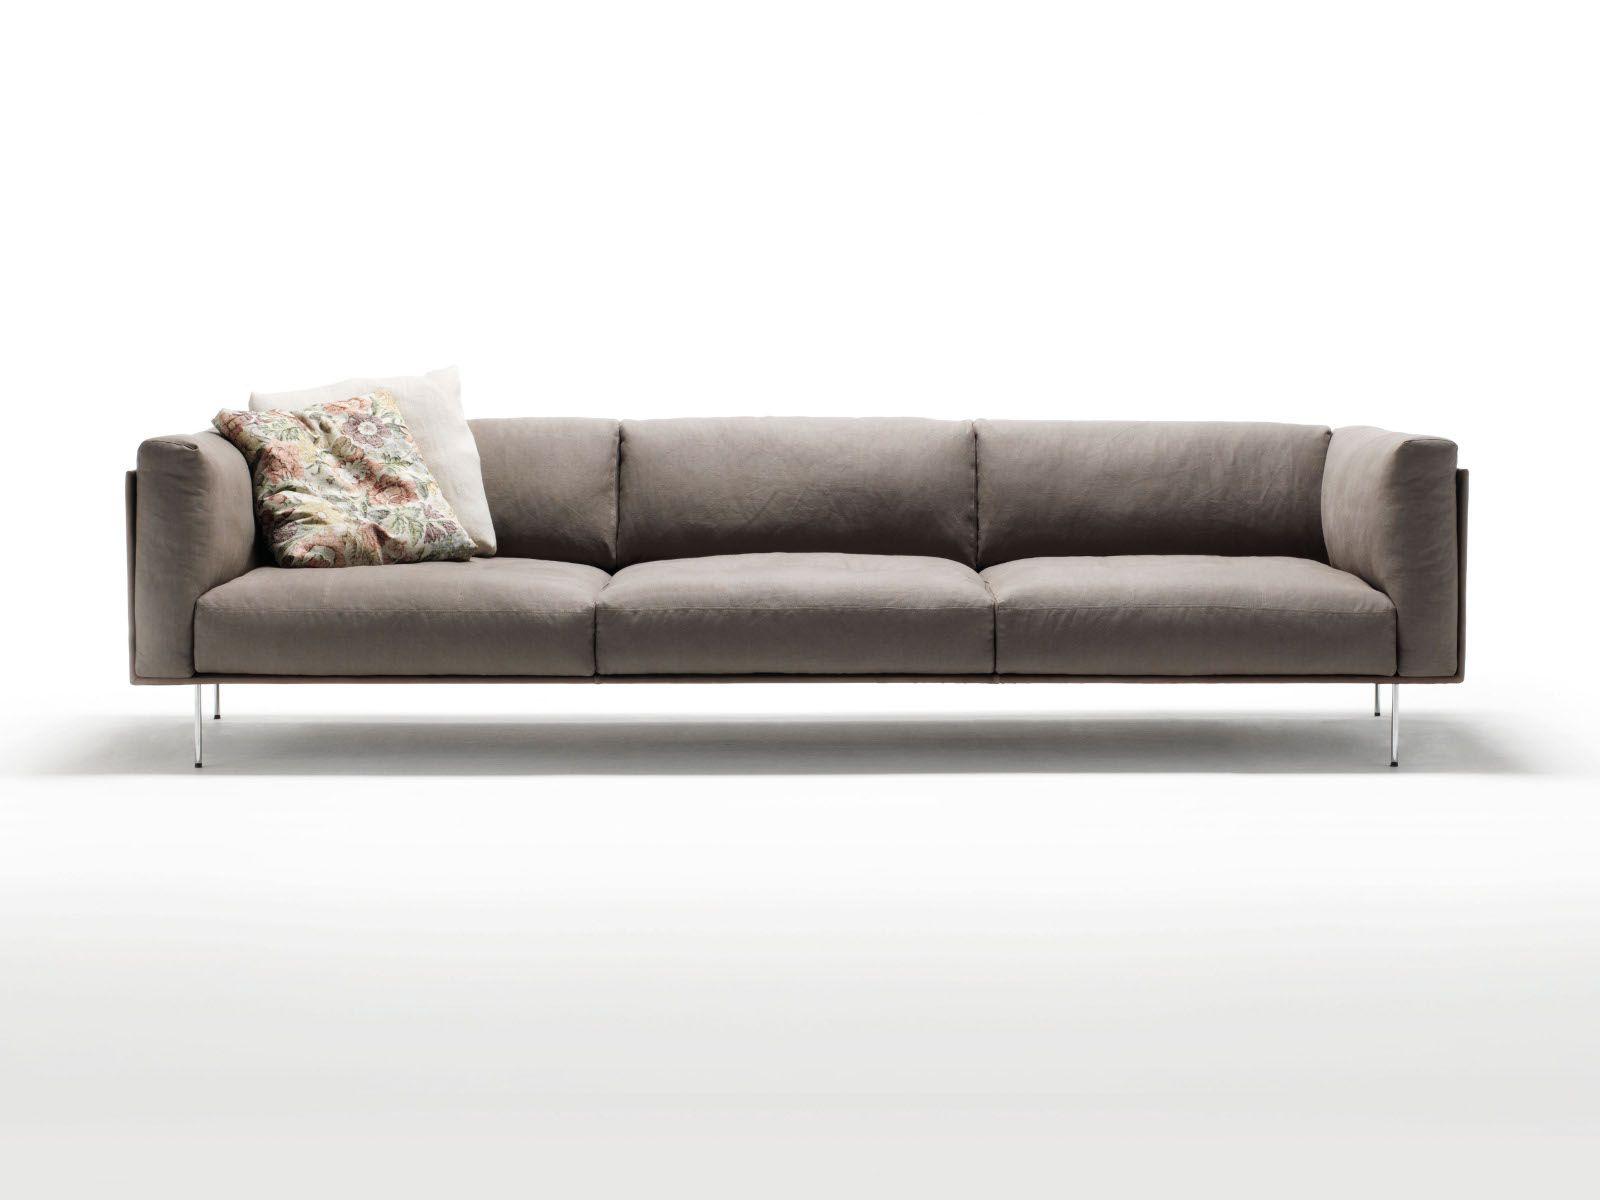 Rod by Living Divani   Chairs   Pinterest   Divani design, Modern ...